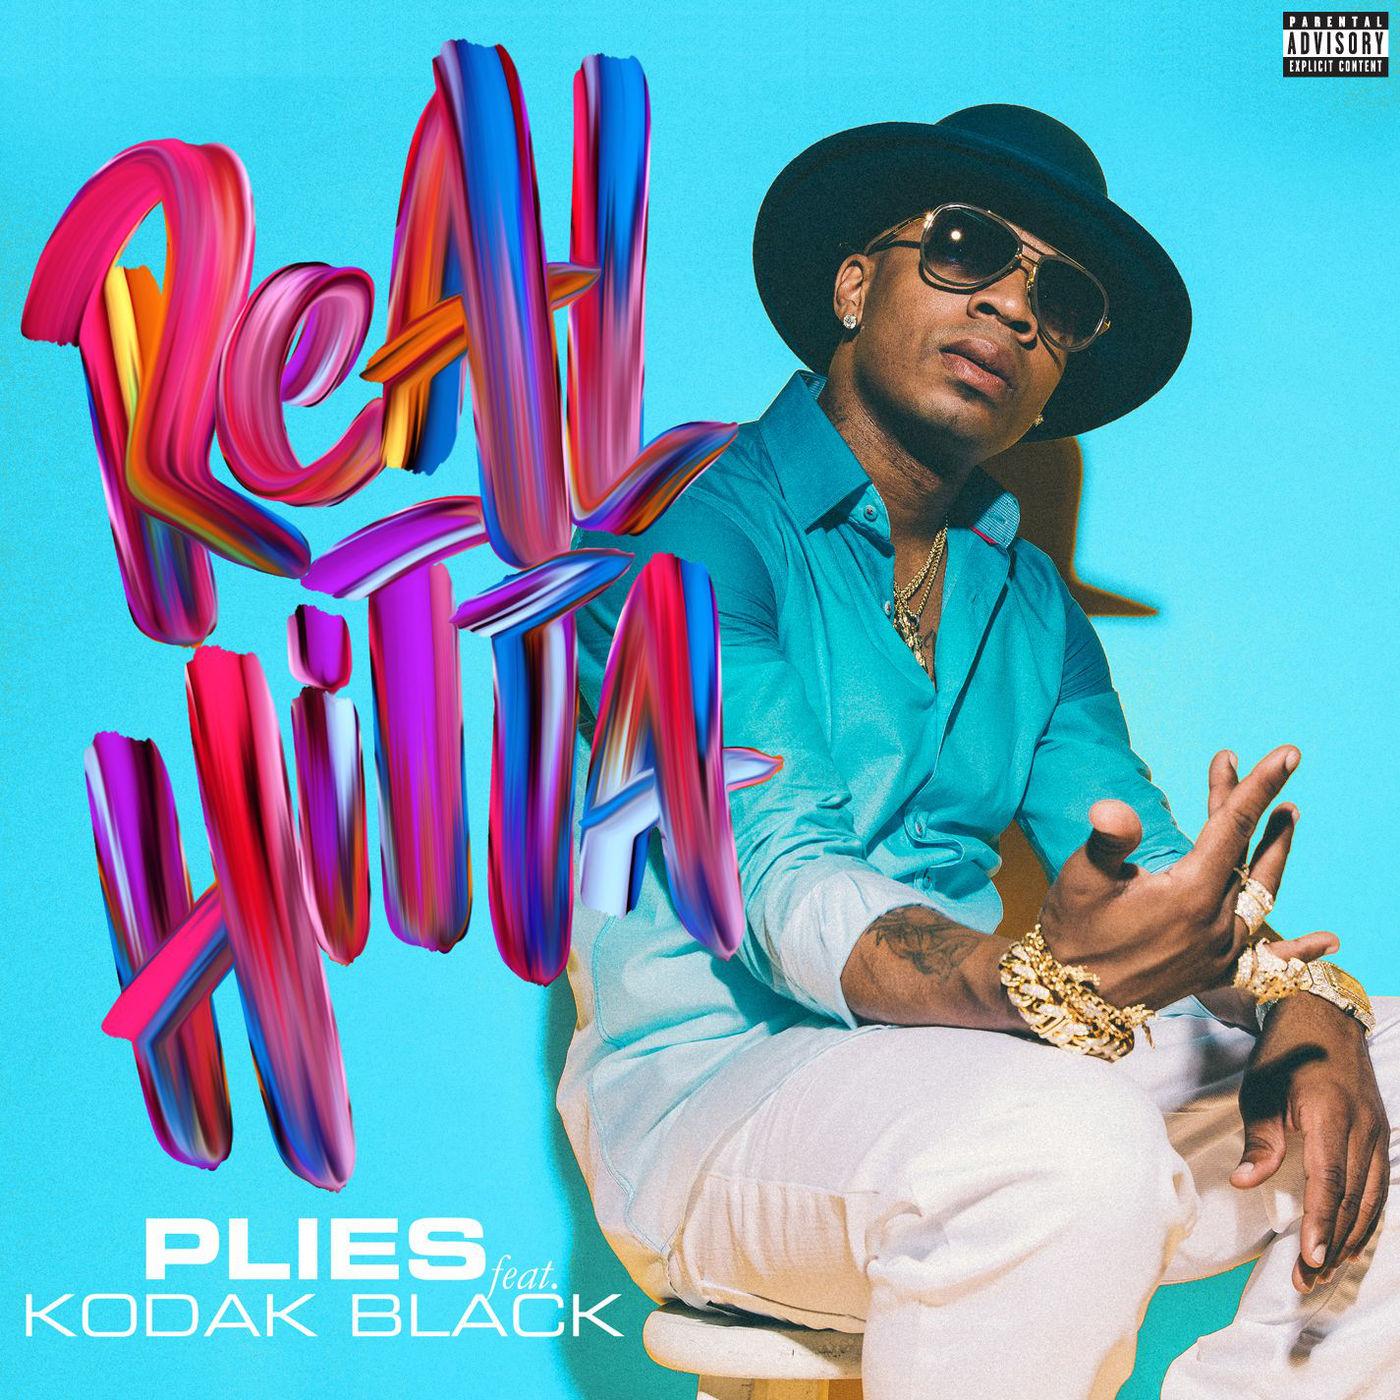 Plies - Real Hitta (feat. Kodak Black) - Single Cover